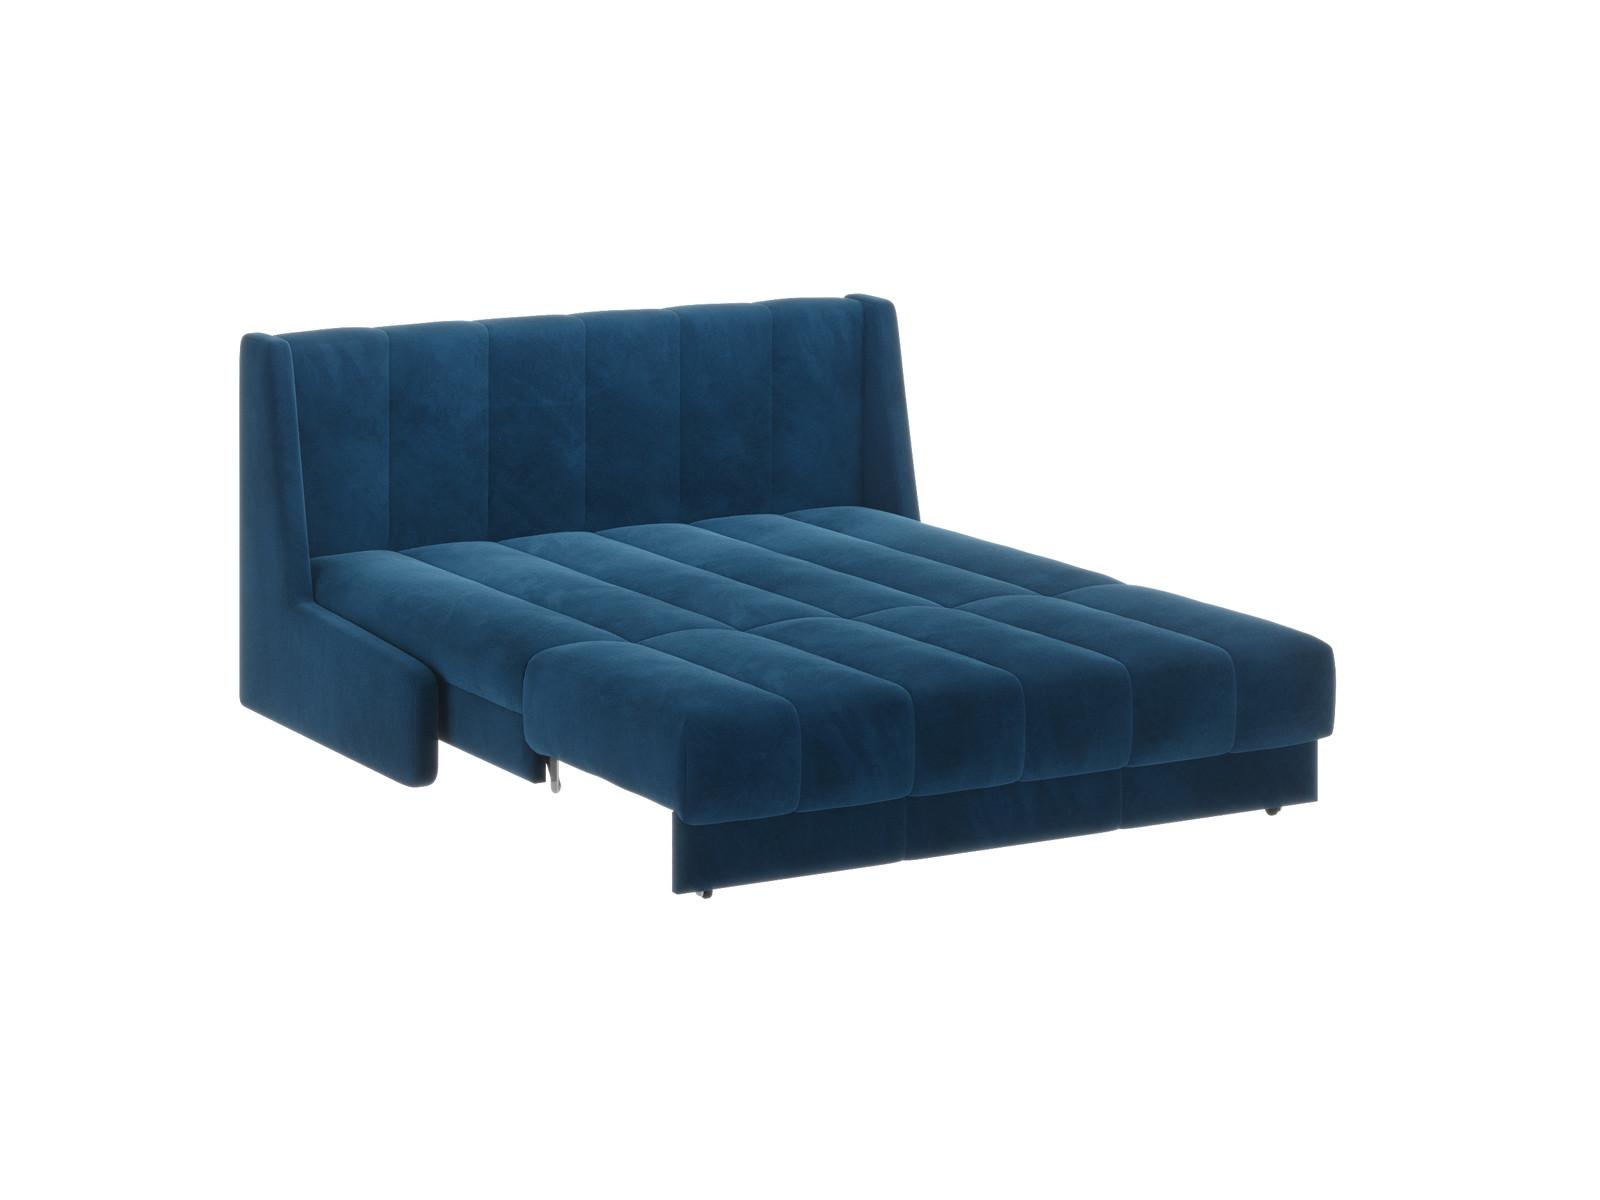 Диван тканевый прямой Венеция D1 furniture 160 см НзПБ Premier синий Синий